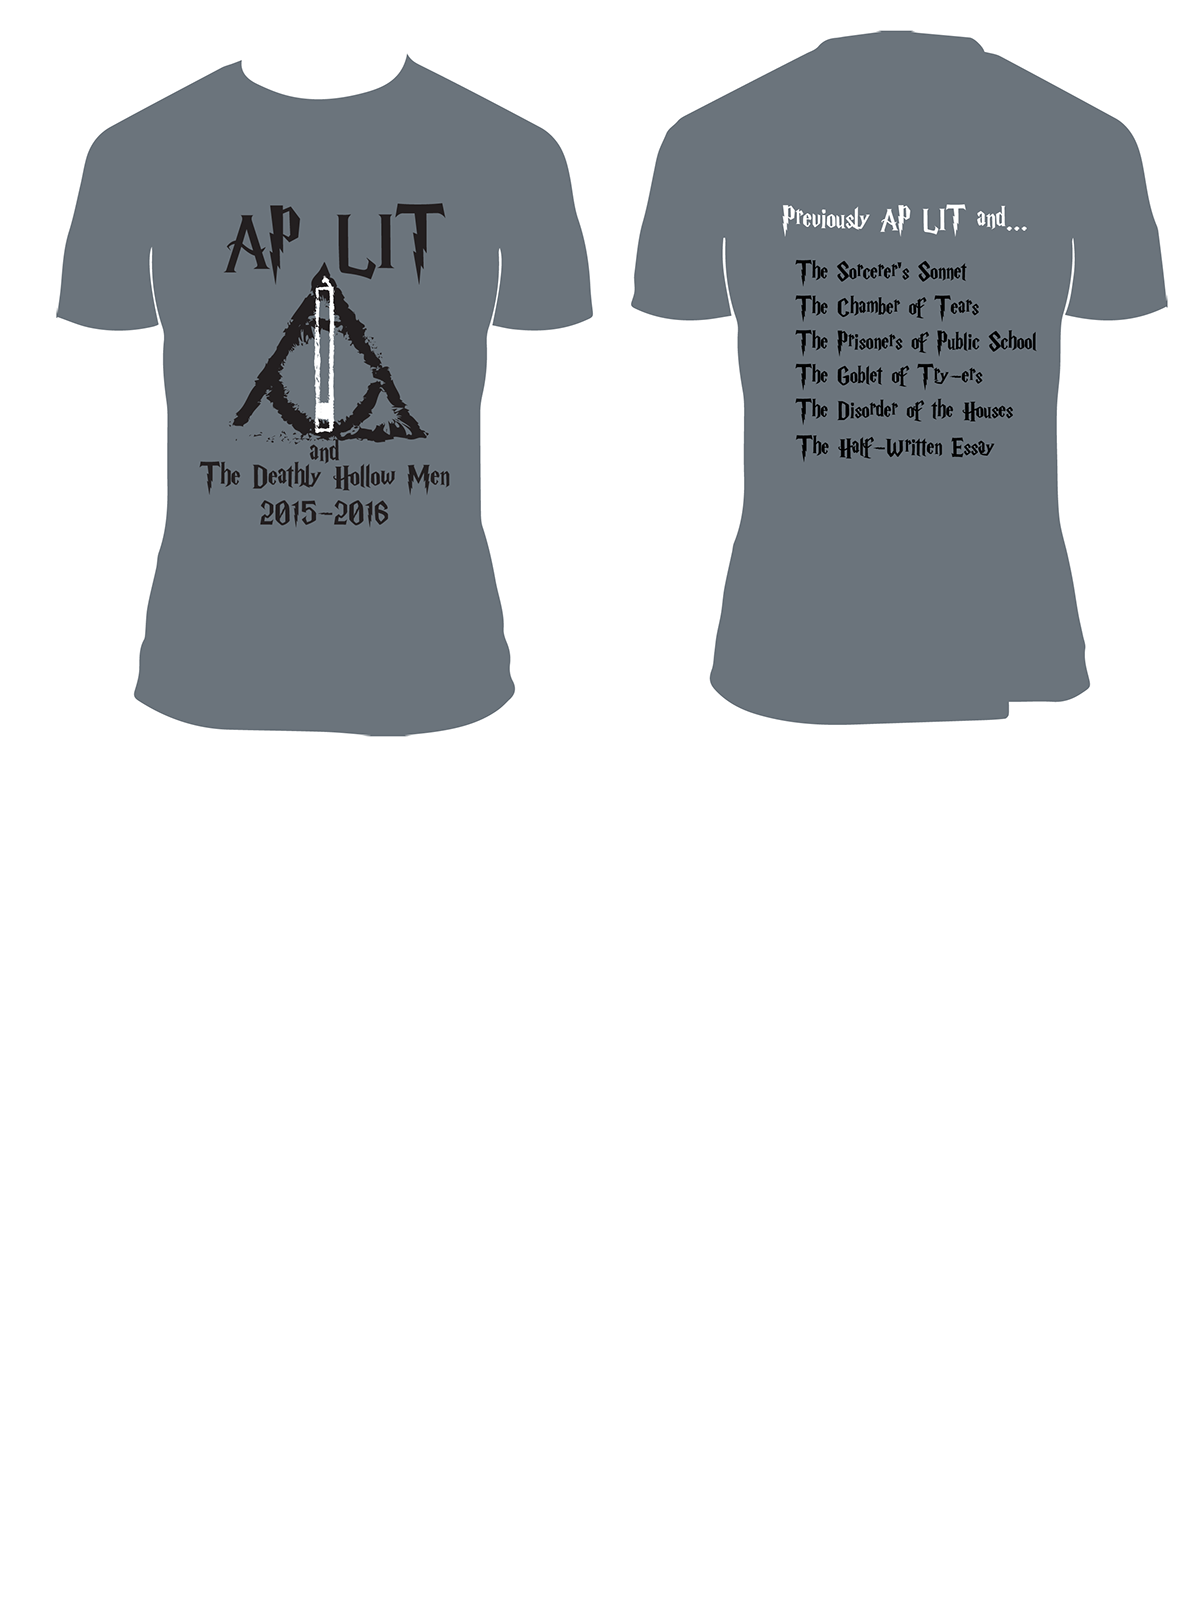 AP Lit Shirt Design On Behance - Lit design 2015